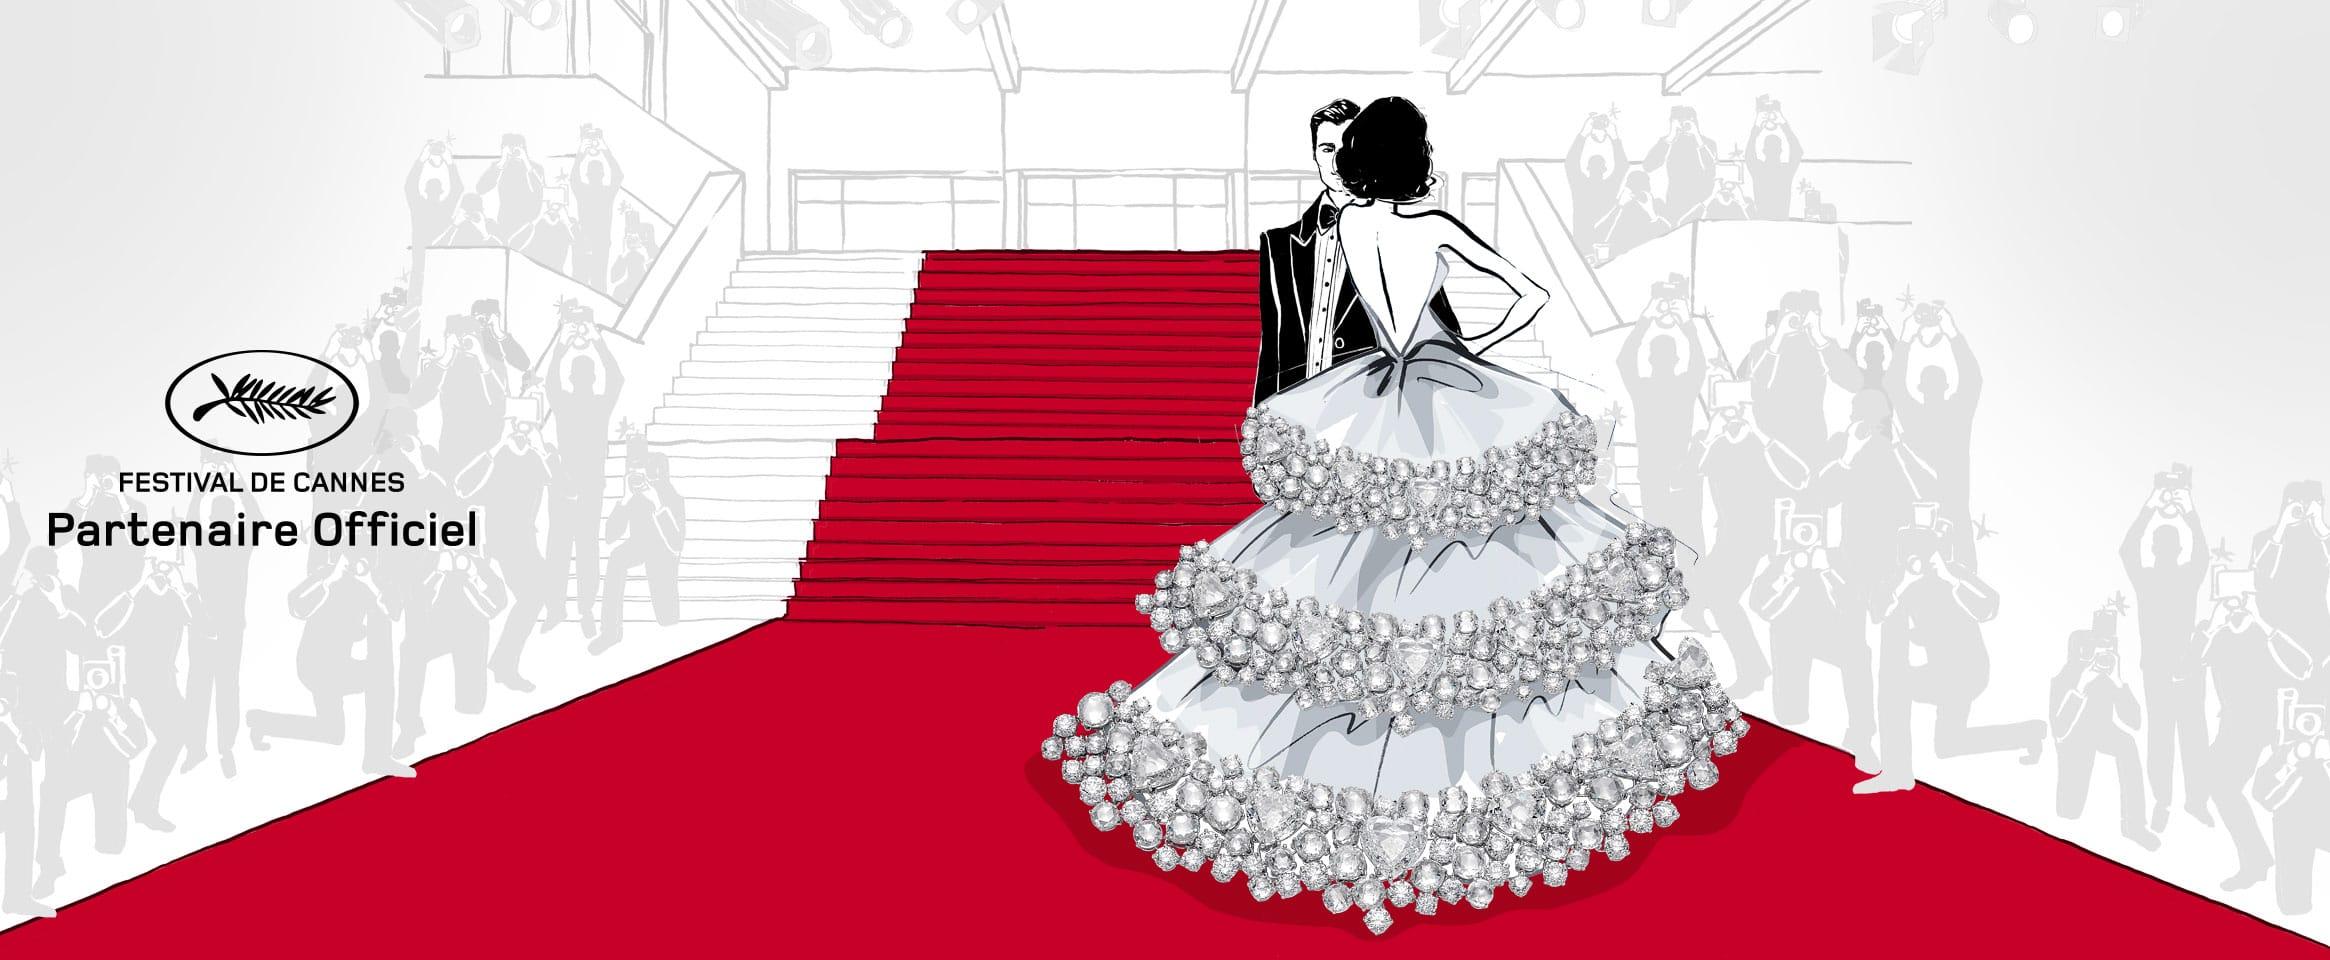 Коллекция Chopard Red Carpet Love для 72-го Каннского фестиваля